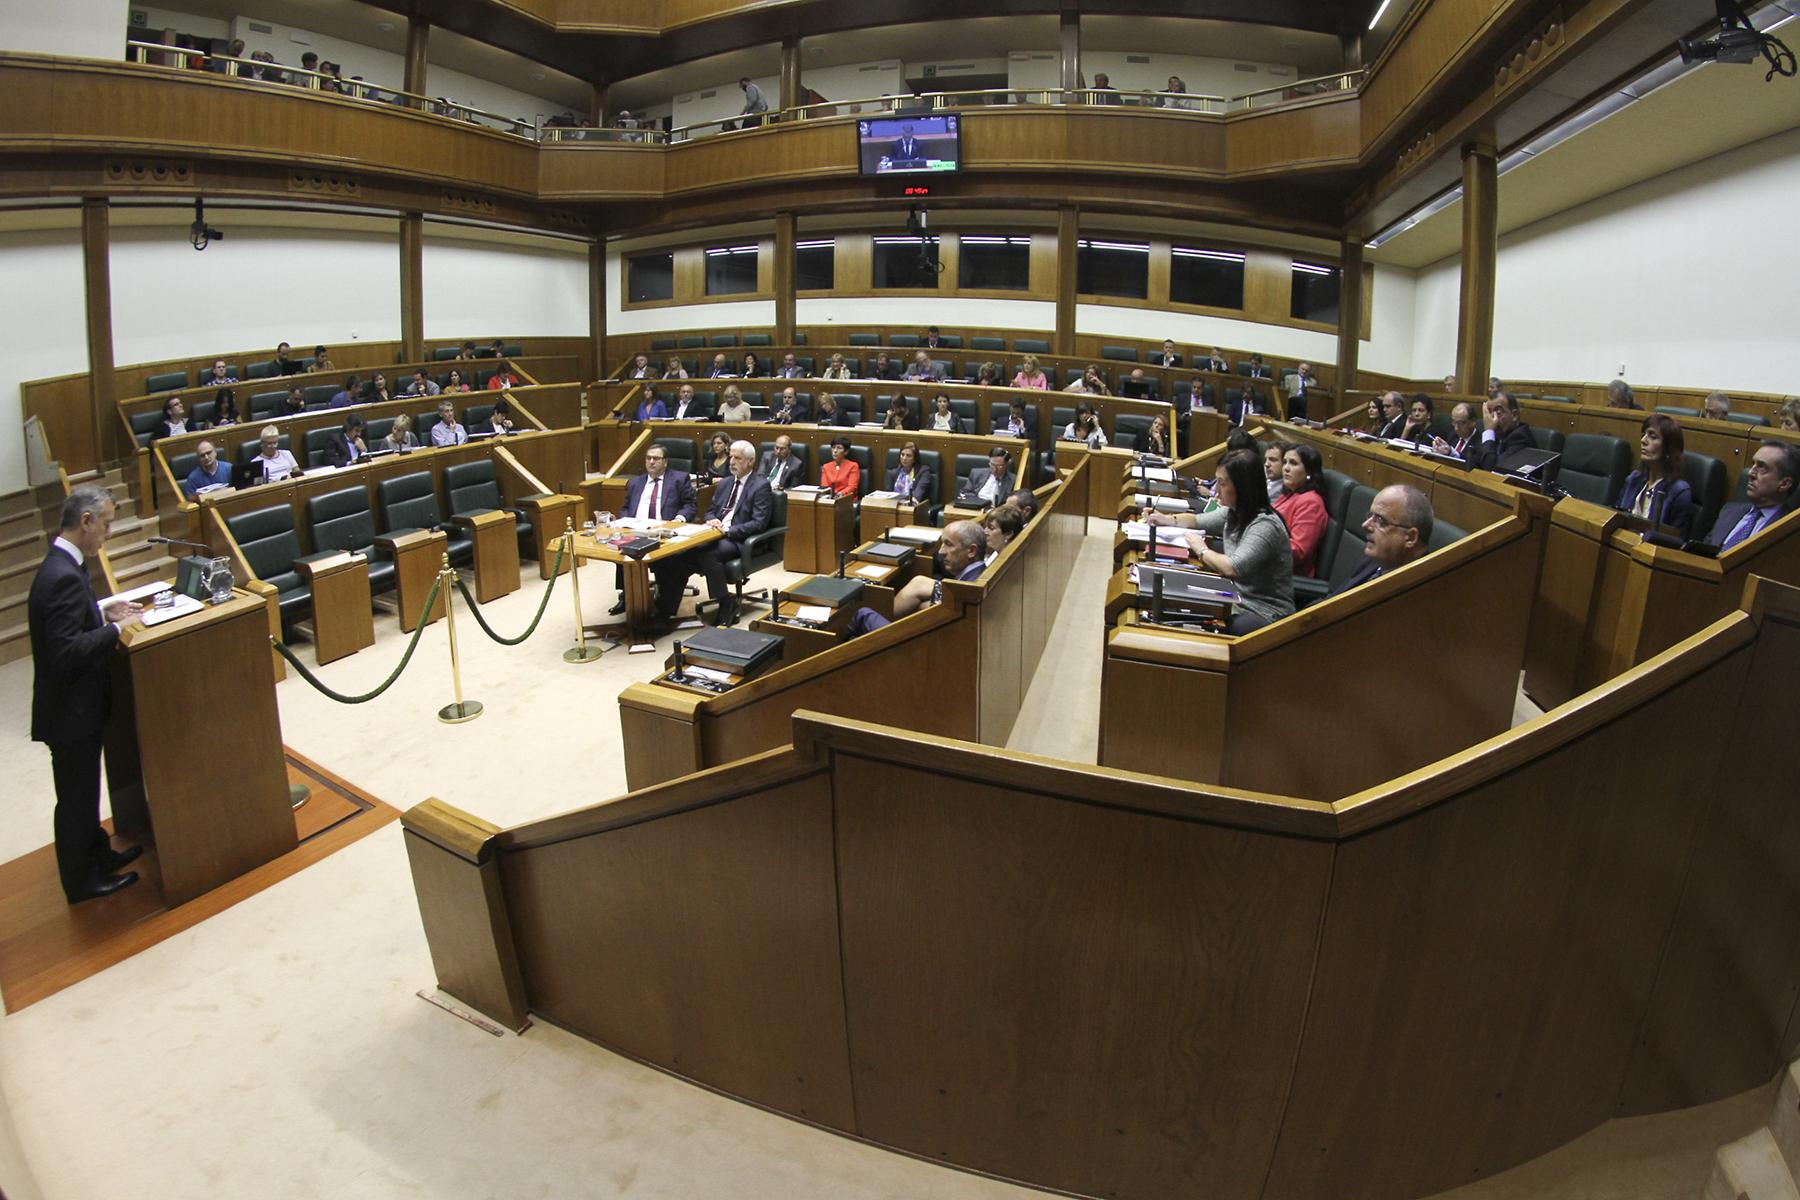 2015_09_24_lhk_parlamento_014.jpg